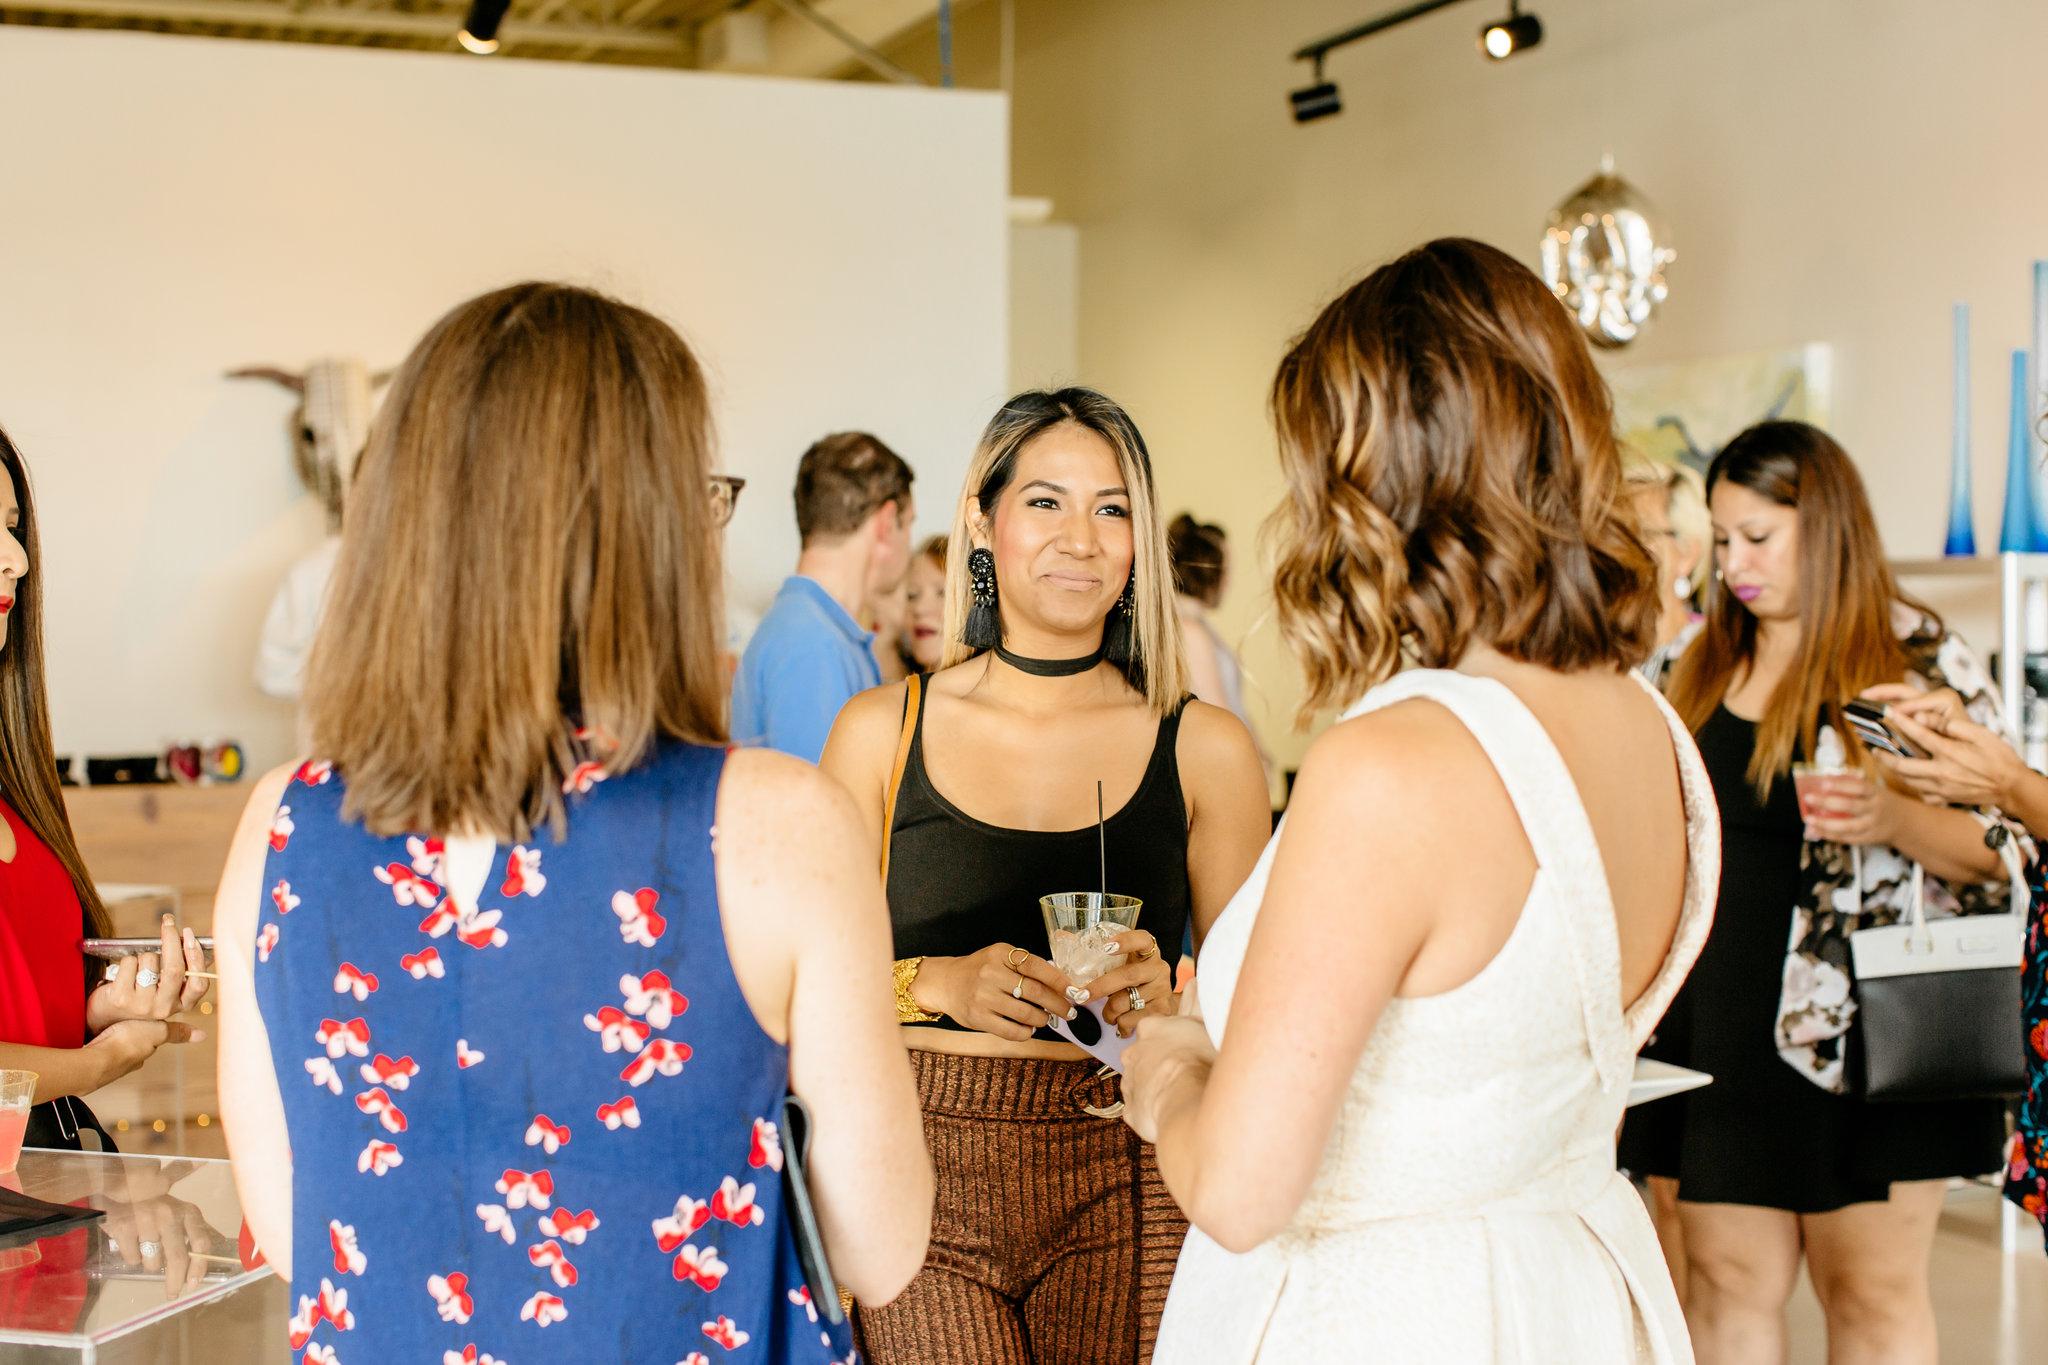 Alexa-Vossler-Photo_Dallas-Event-Photographer_Brite-Bar-Beauty-2018-Lipstick-Launch-Party-28.jpg